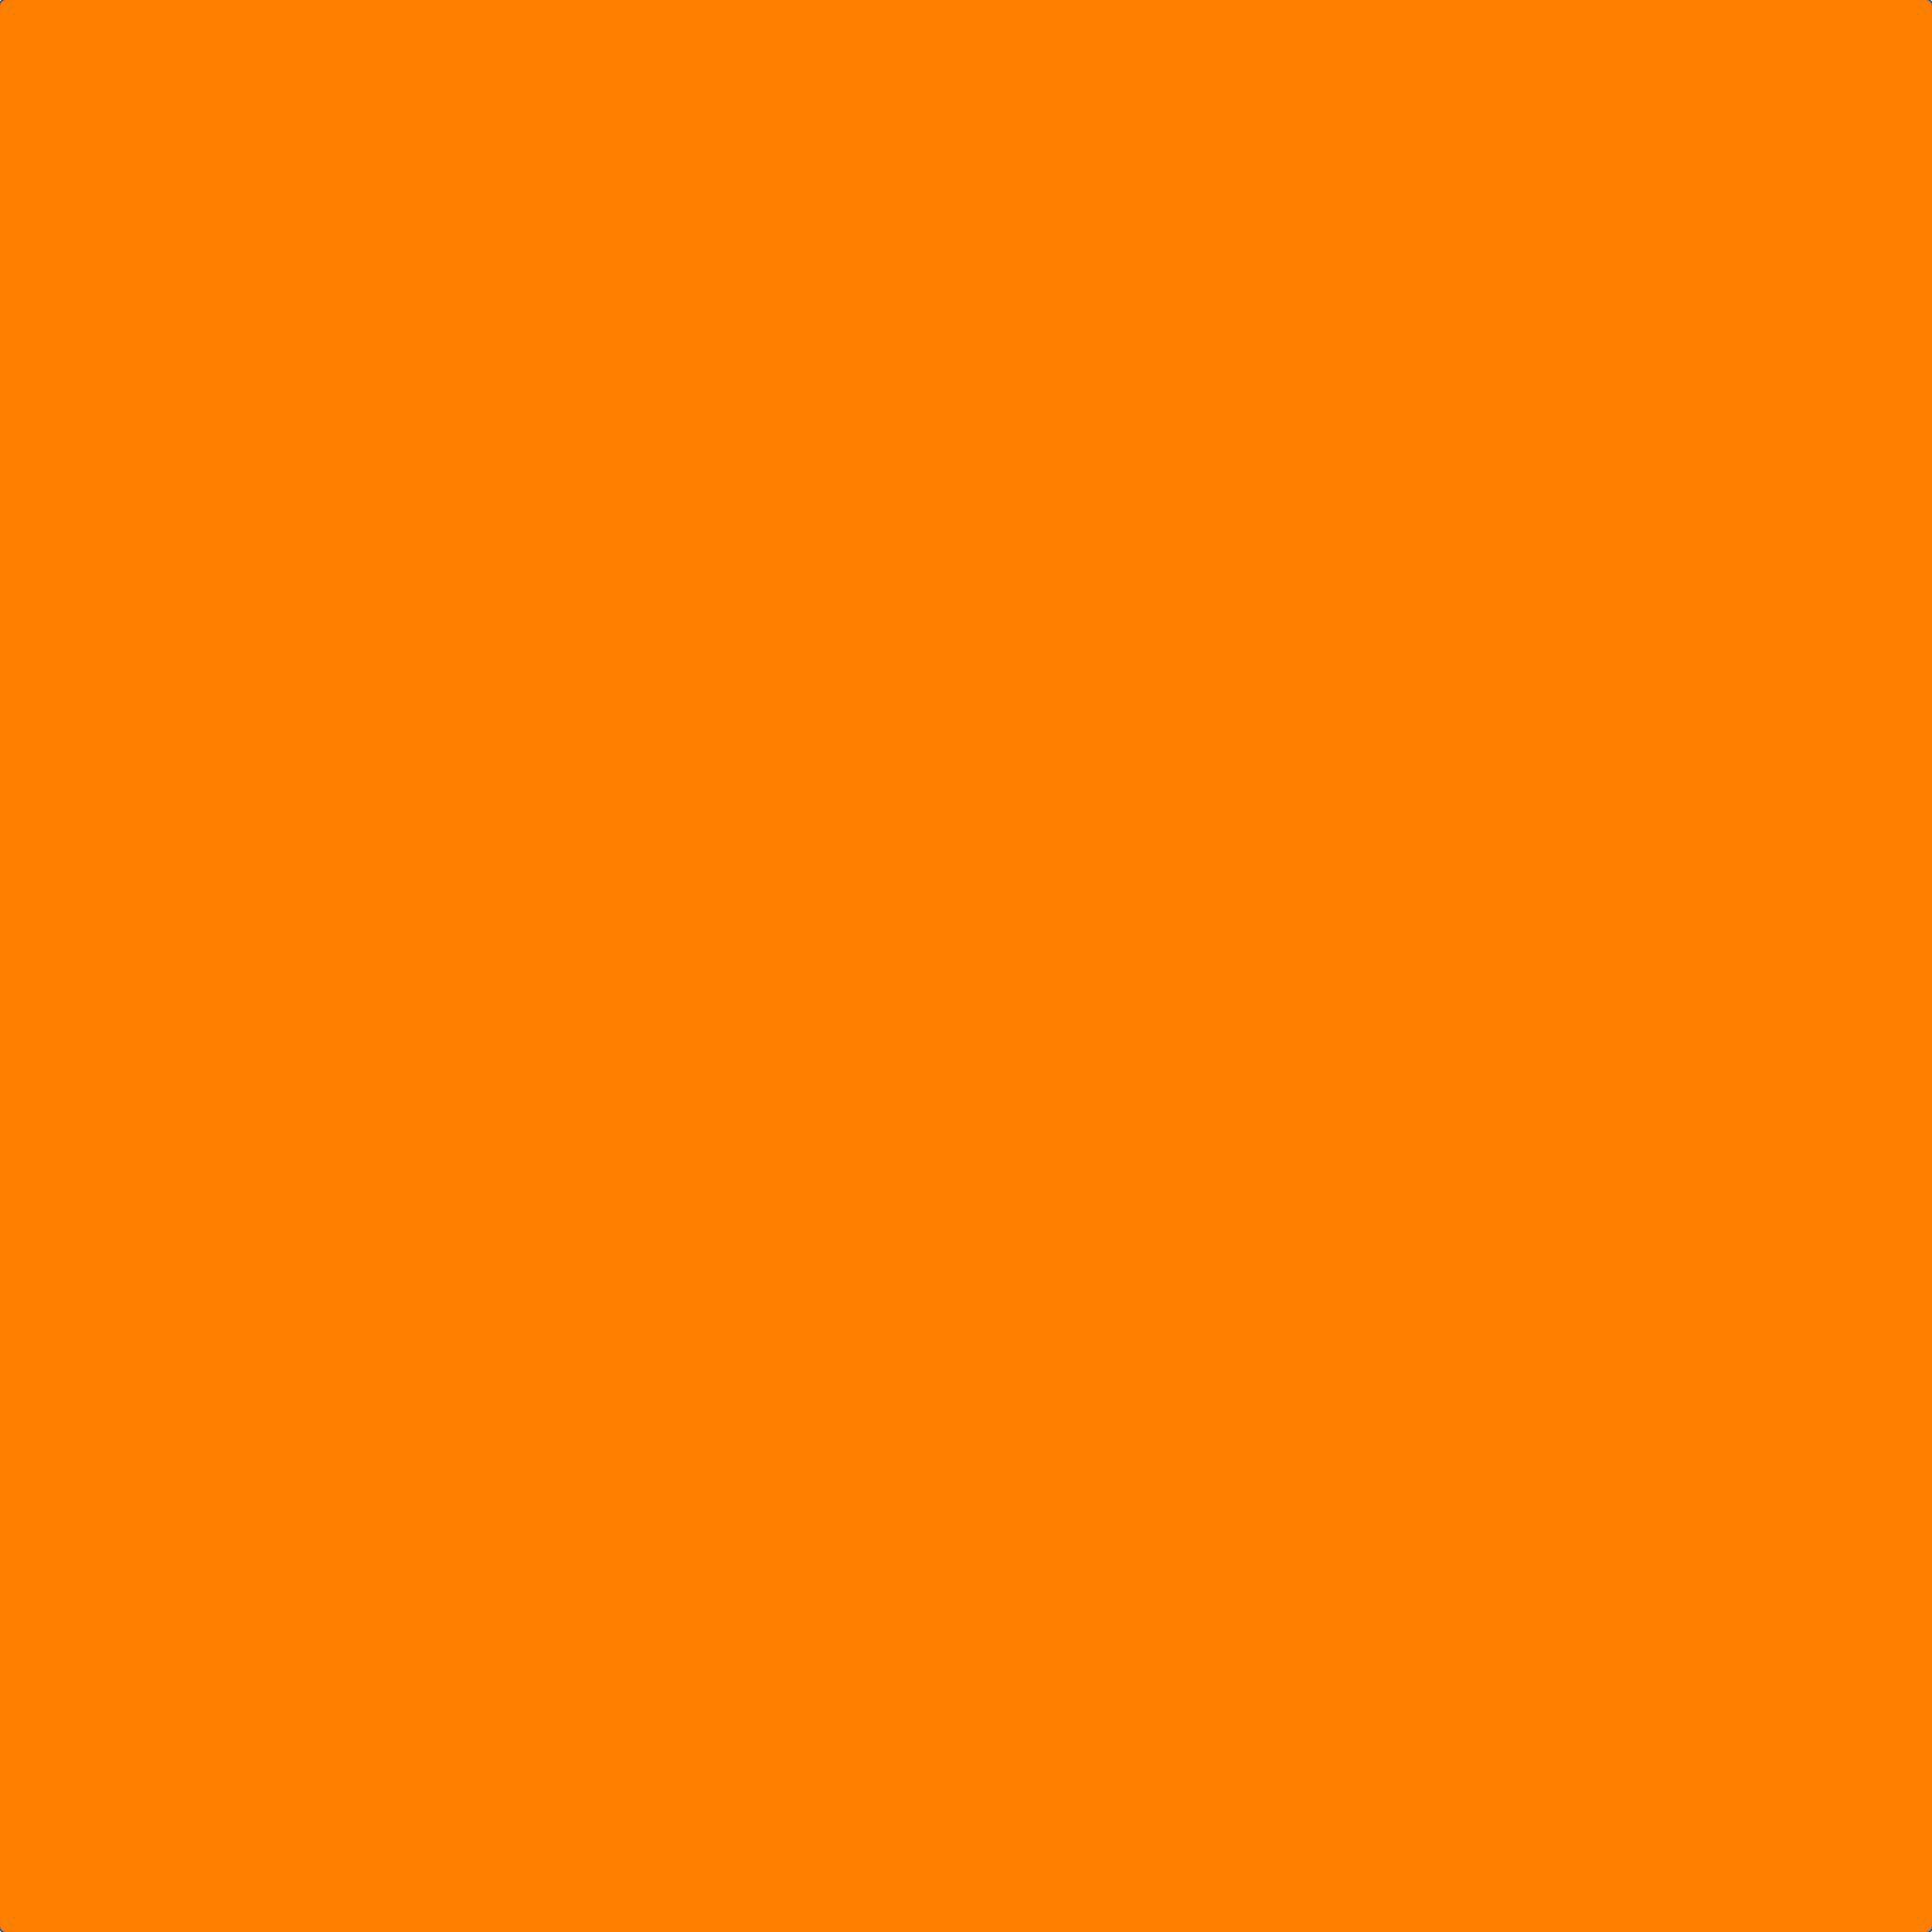 Orange Wallpaper Hd: Orange Wallpaper Background (56+ Images